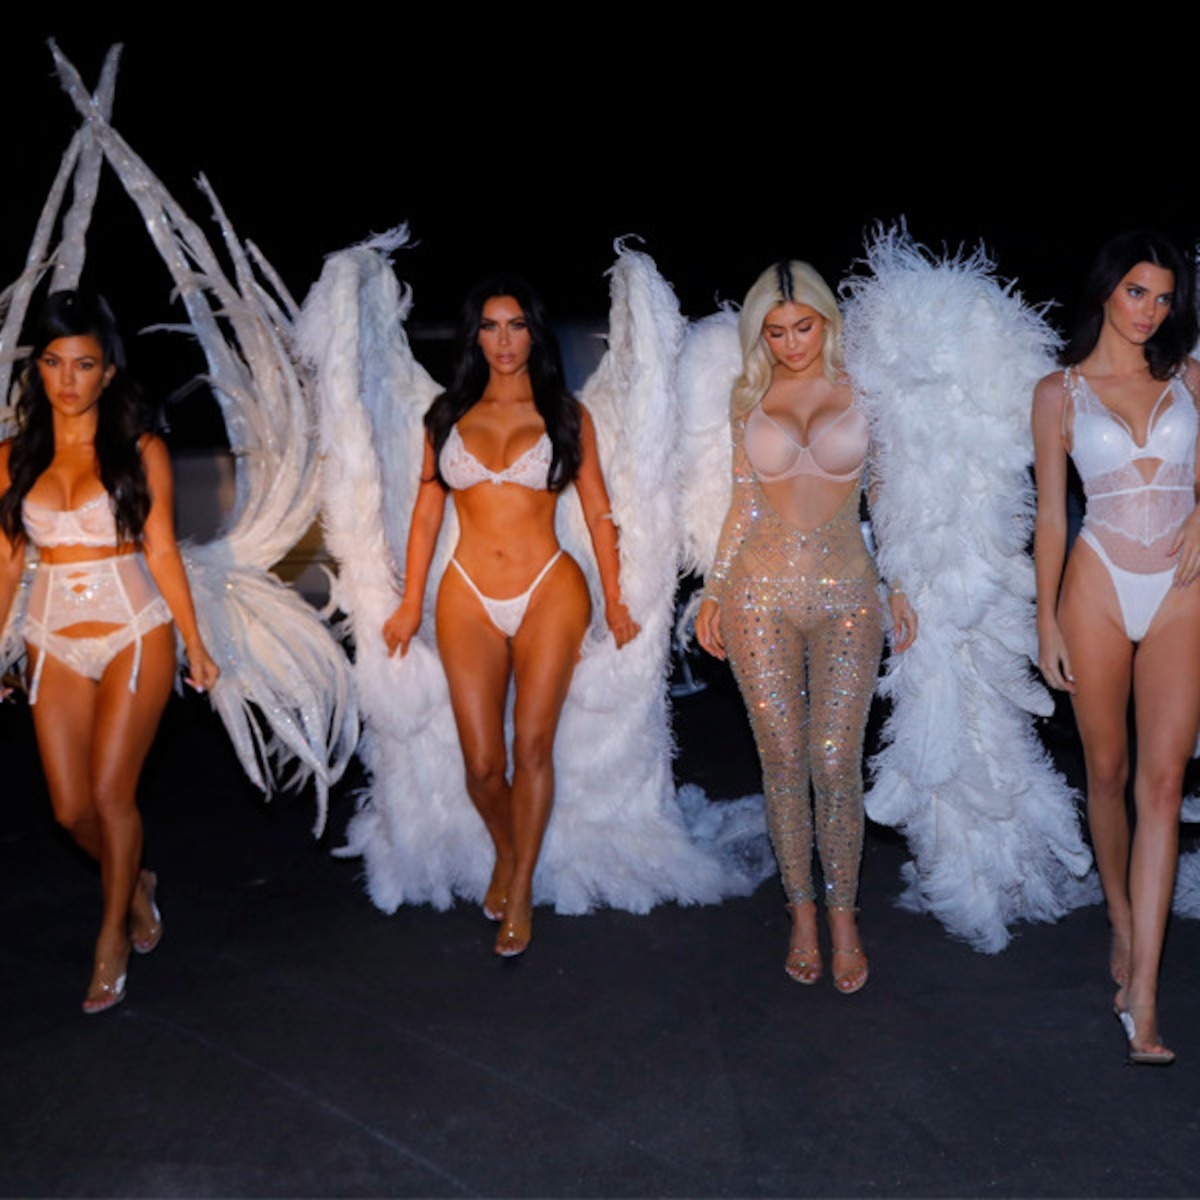 Kardashian Jenner Halloween 2020 Angels Kendall Jenner Flaunts Her Booty in Throwback Halloween Photo   E